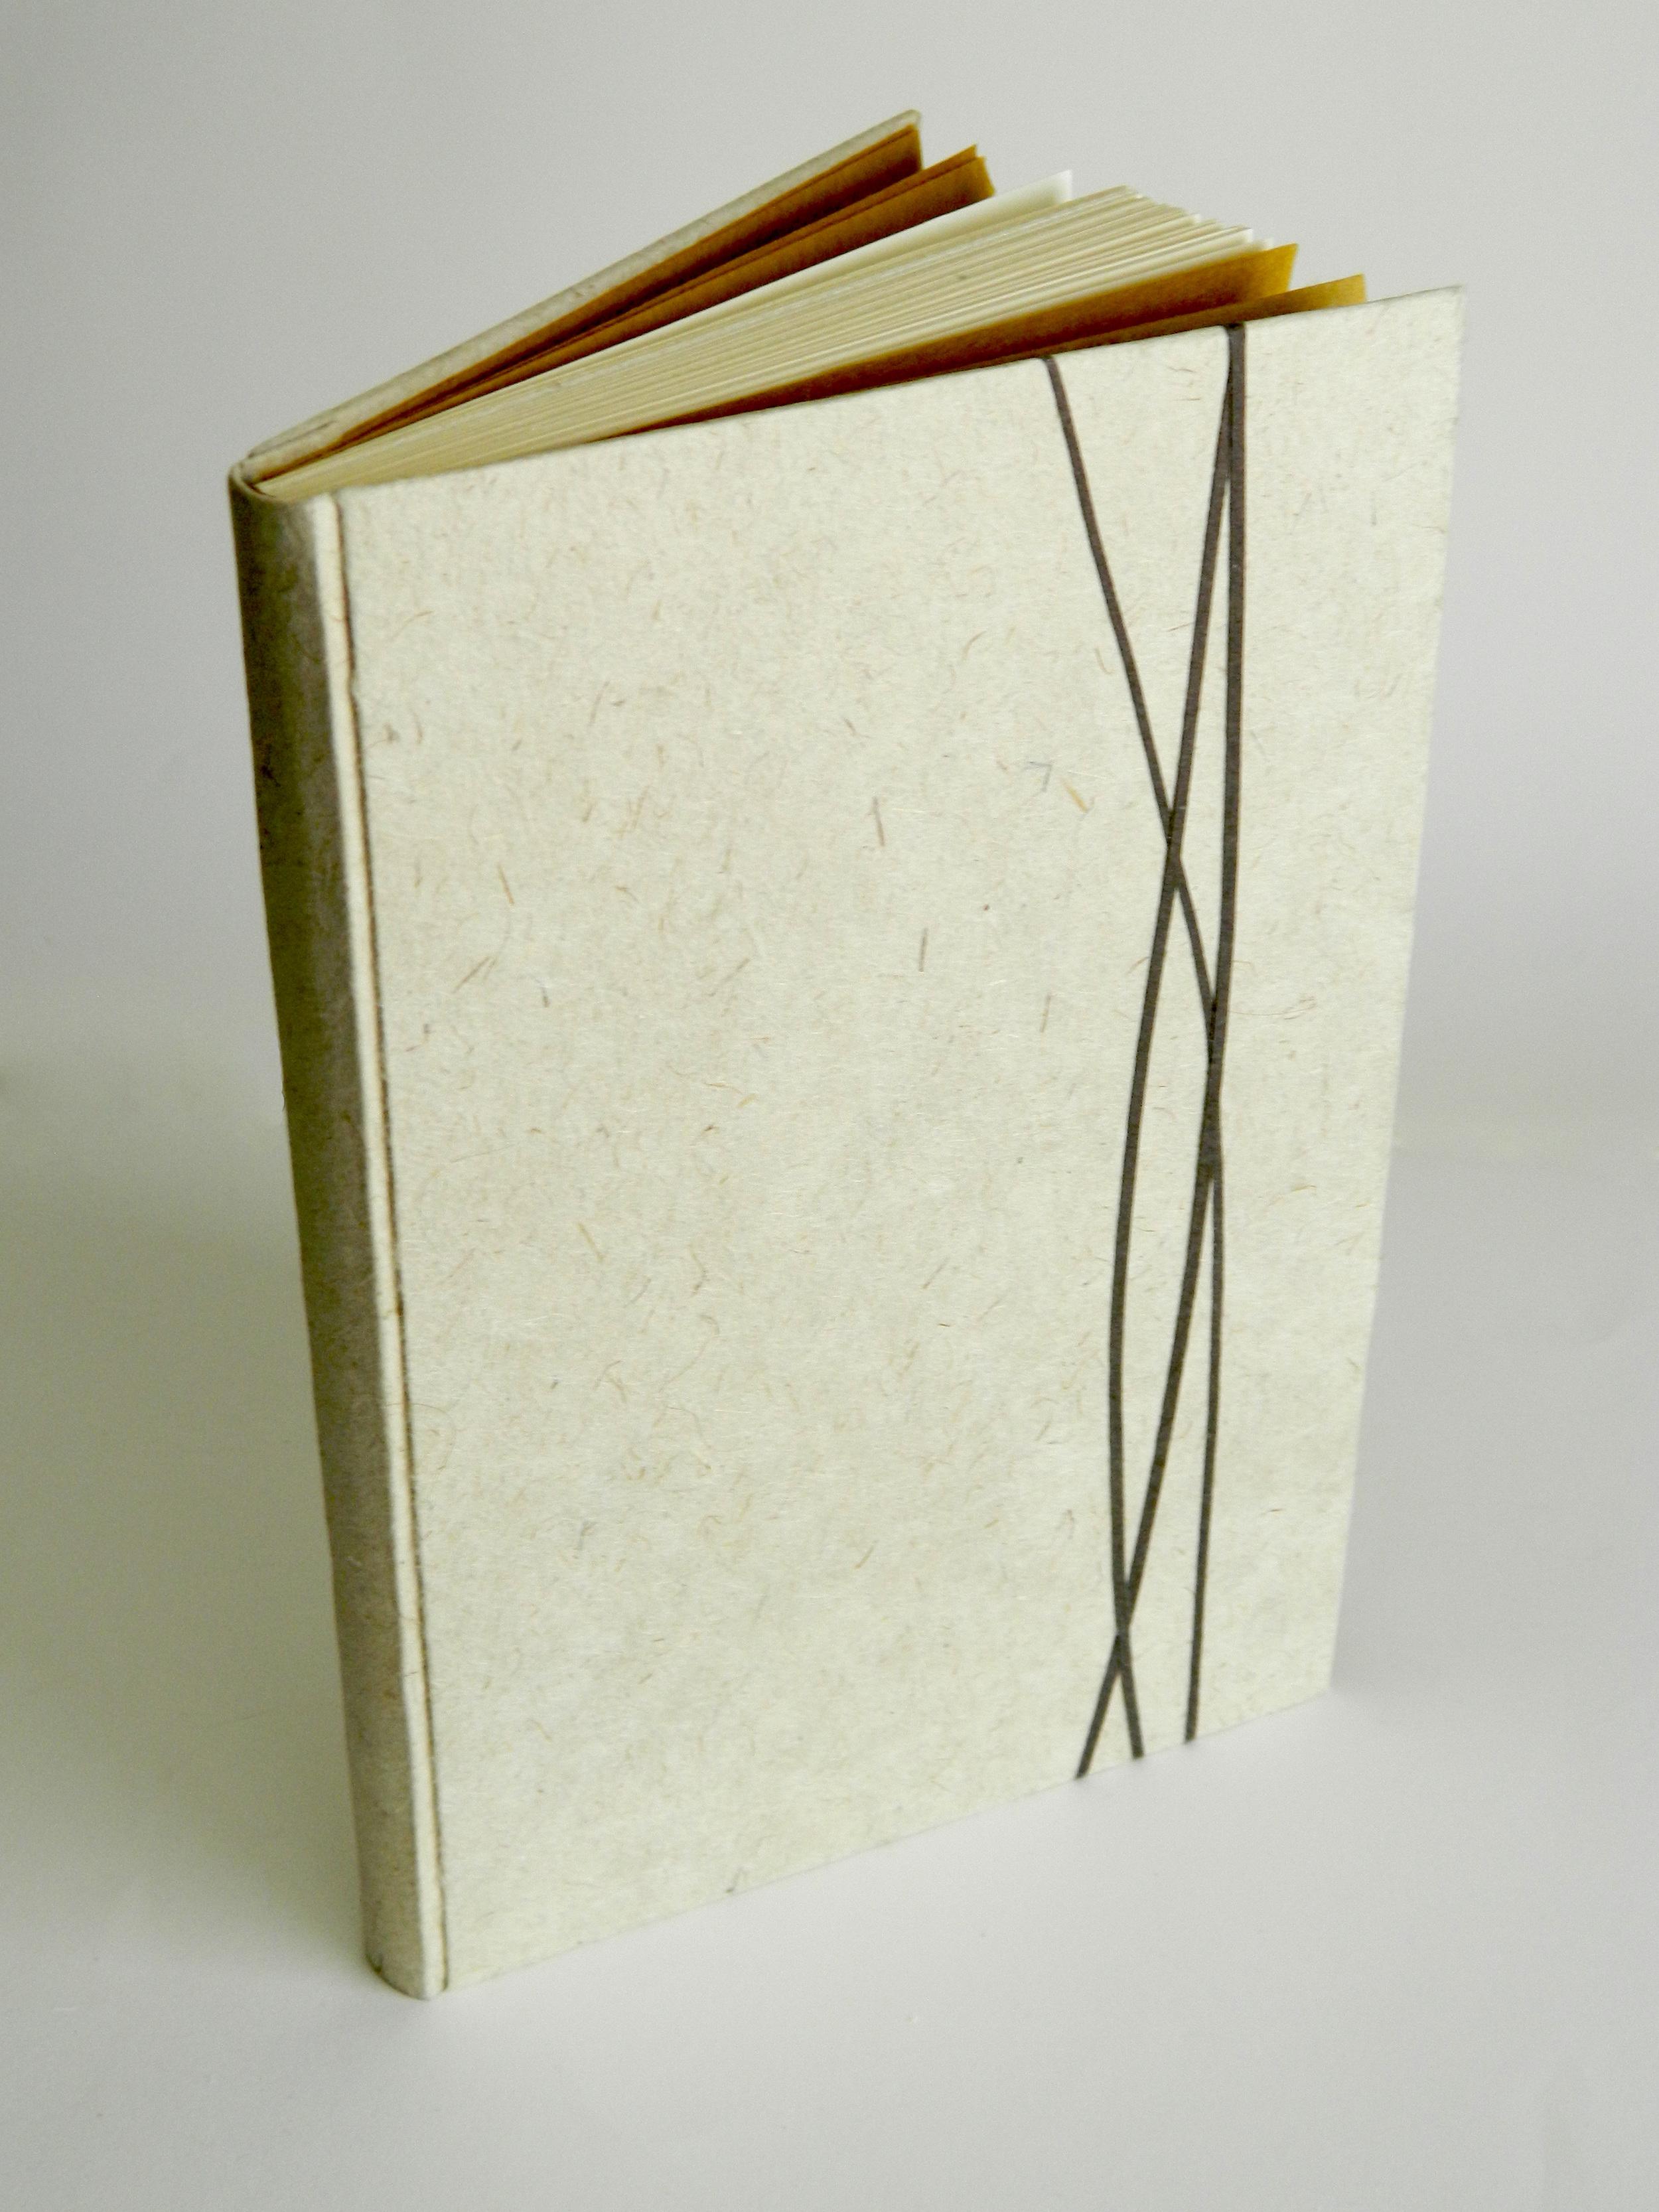 Simplified binding